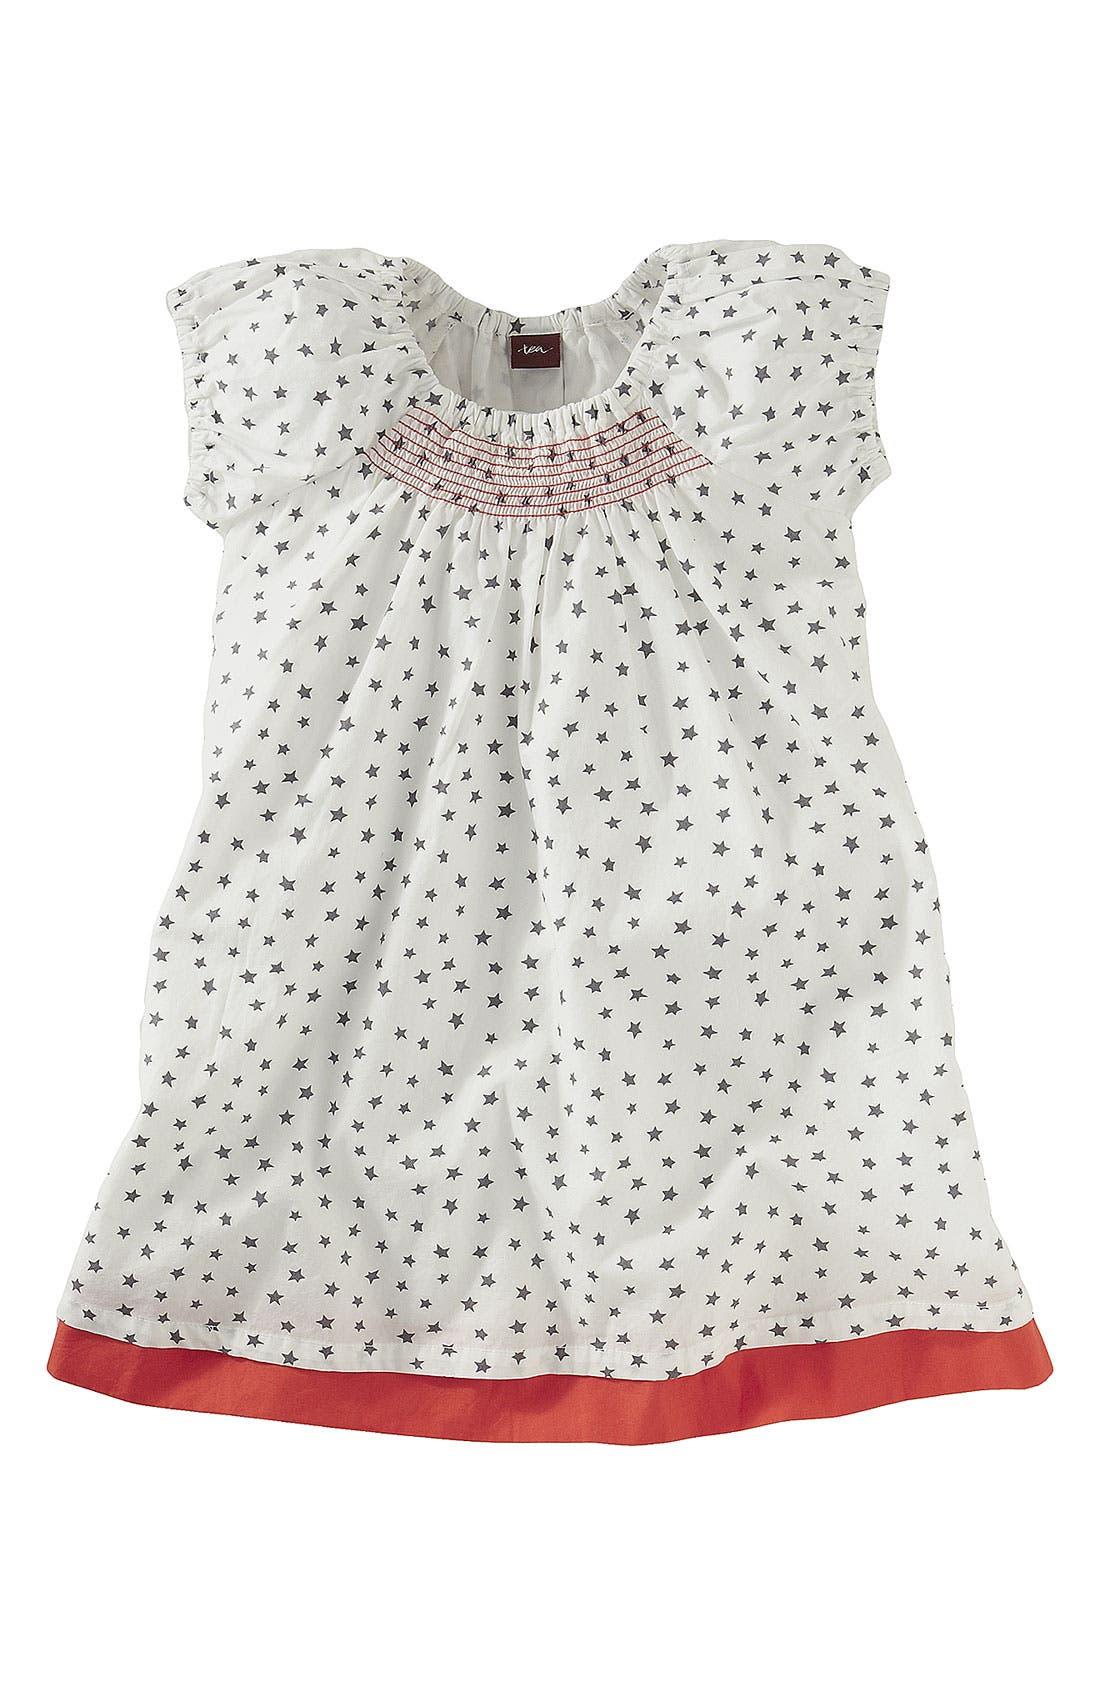 Main Image - Tea Collection Smocked Dress (Infant)